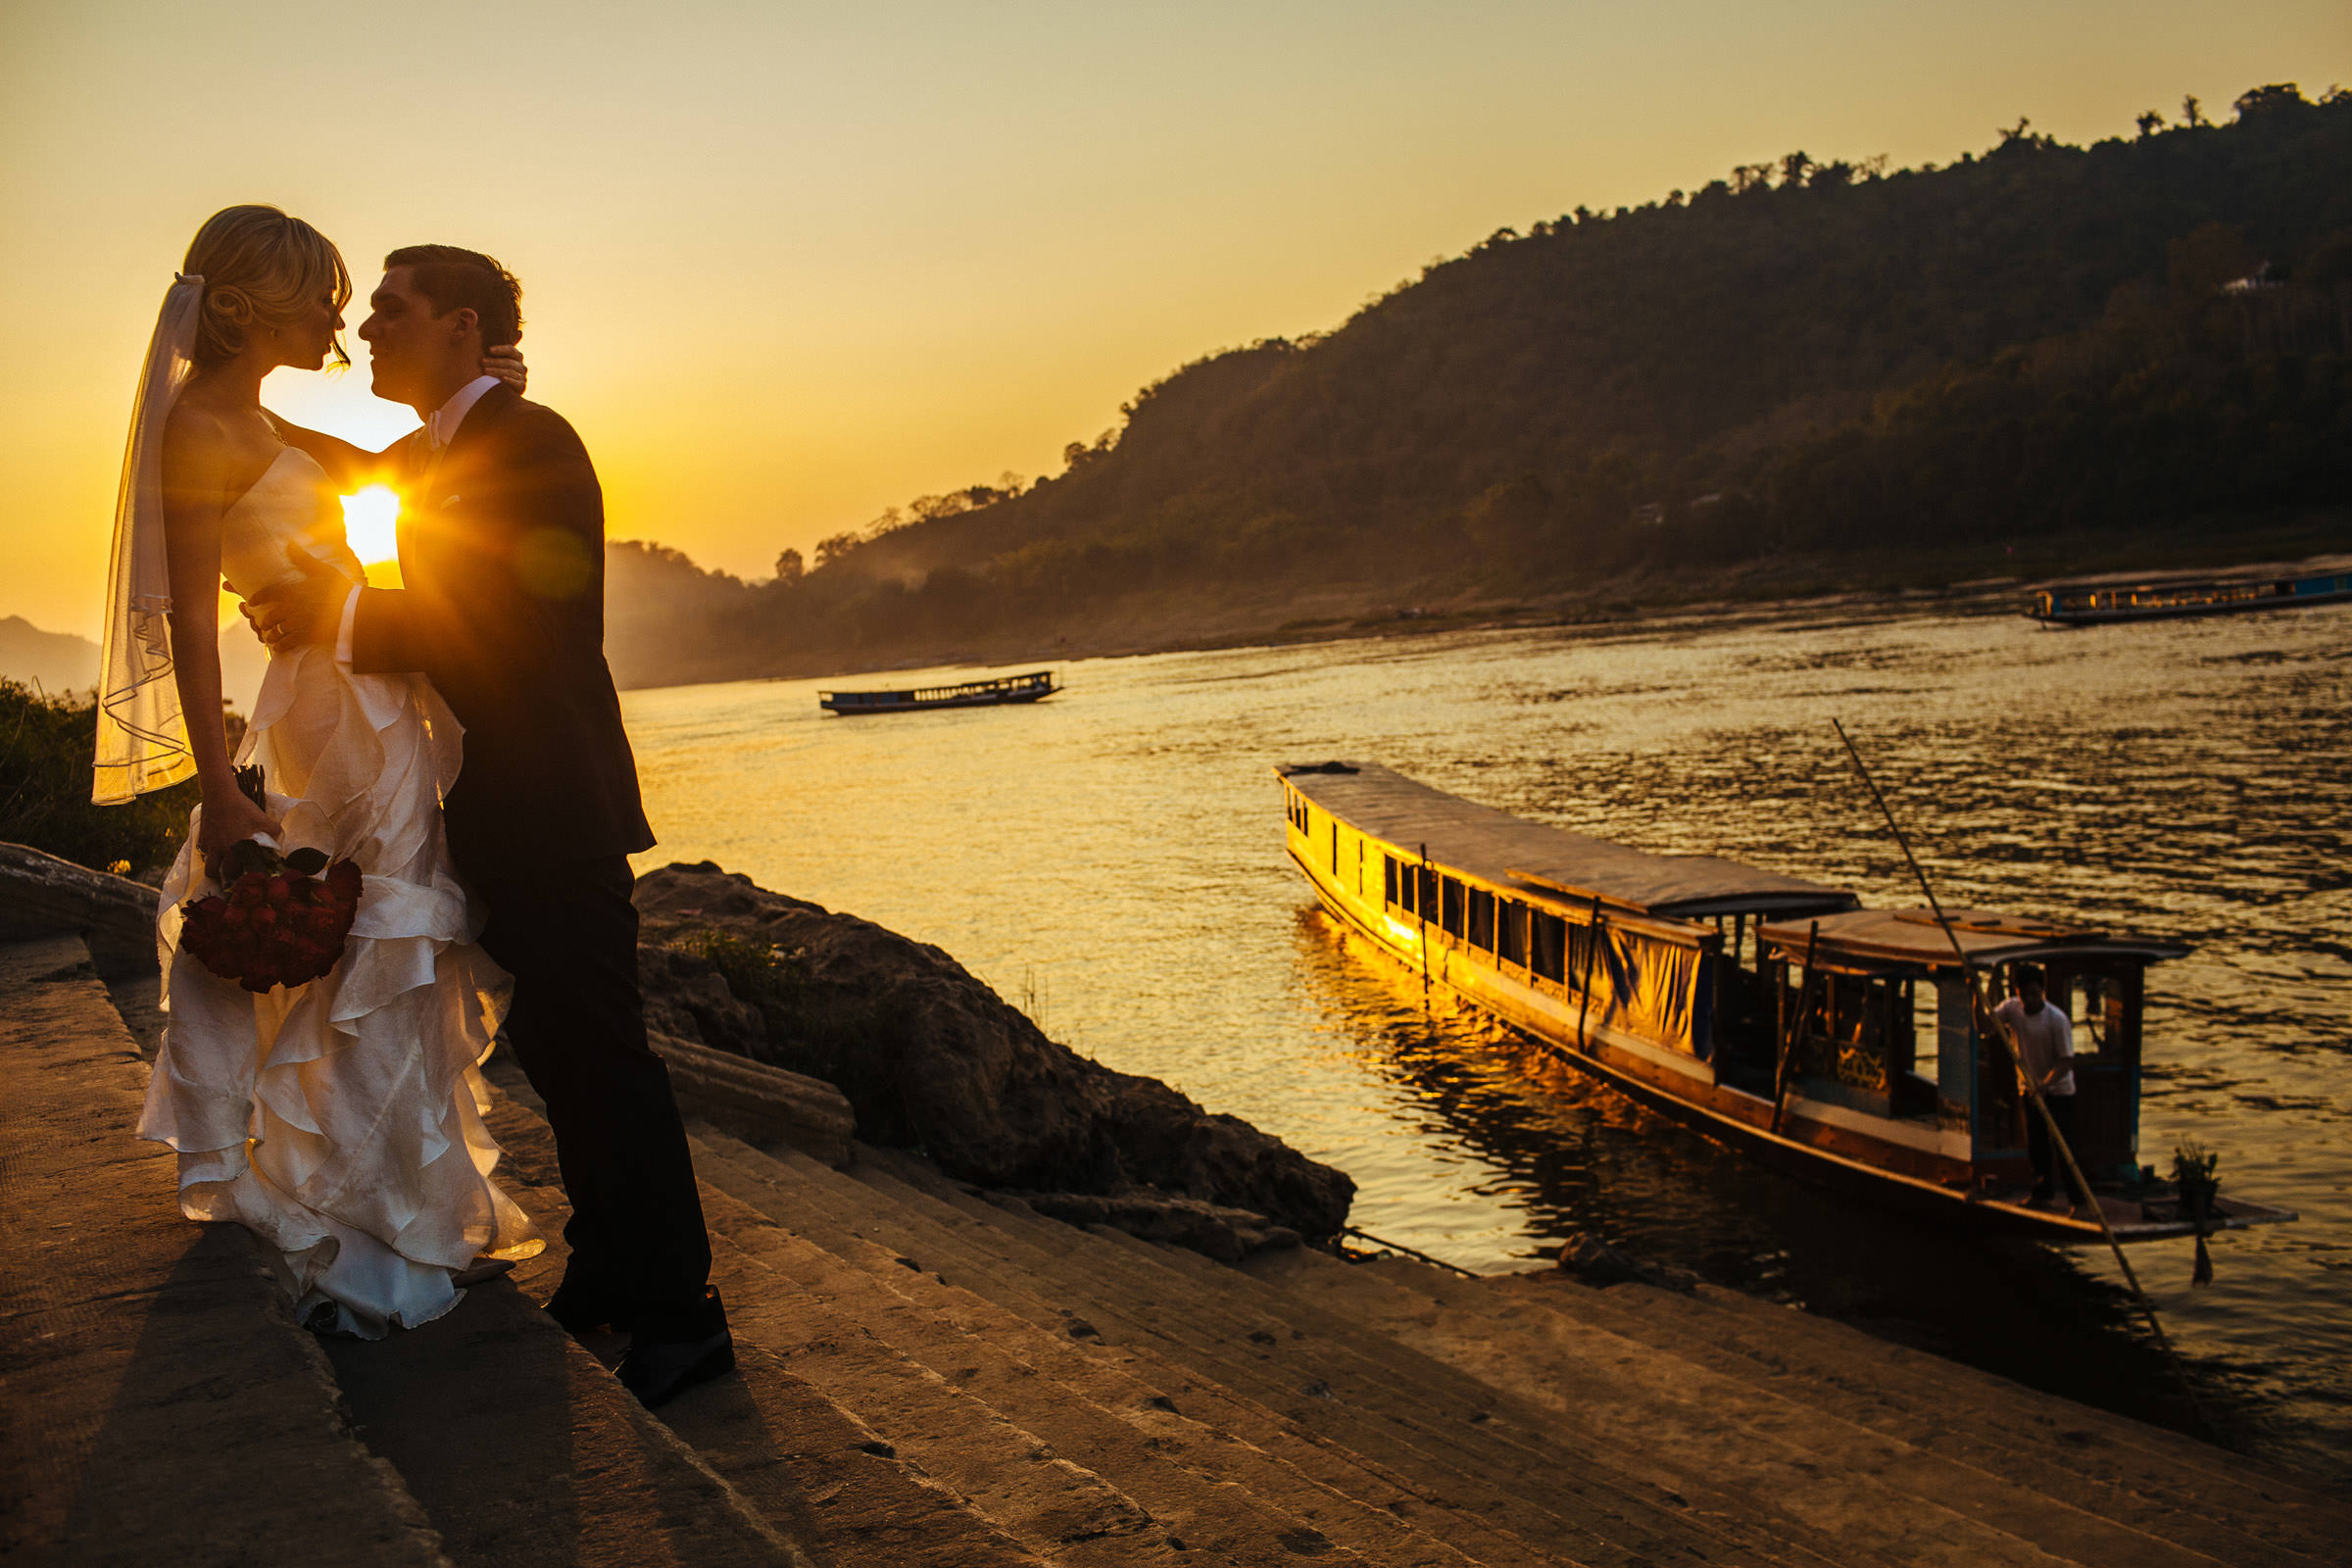 Sunset kiss - Photo by Wainwright Weddings